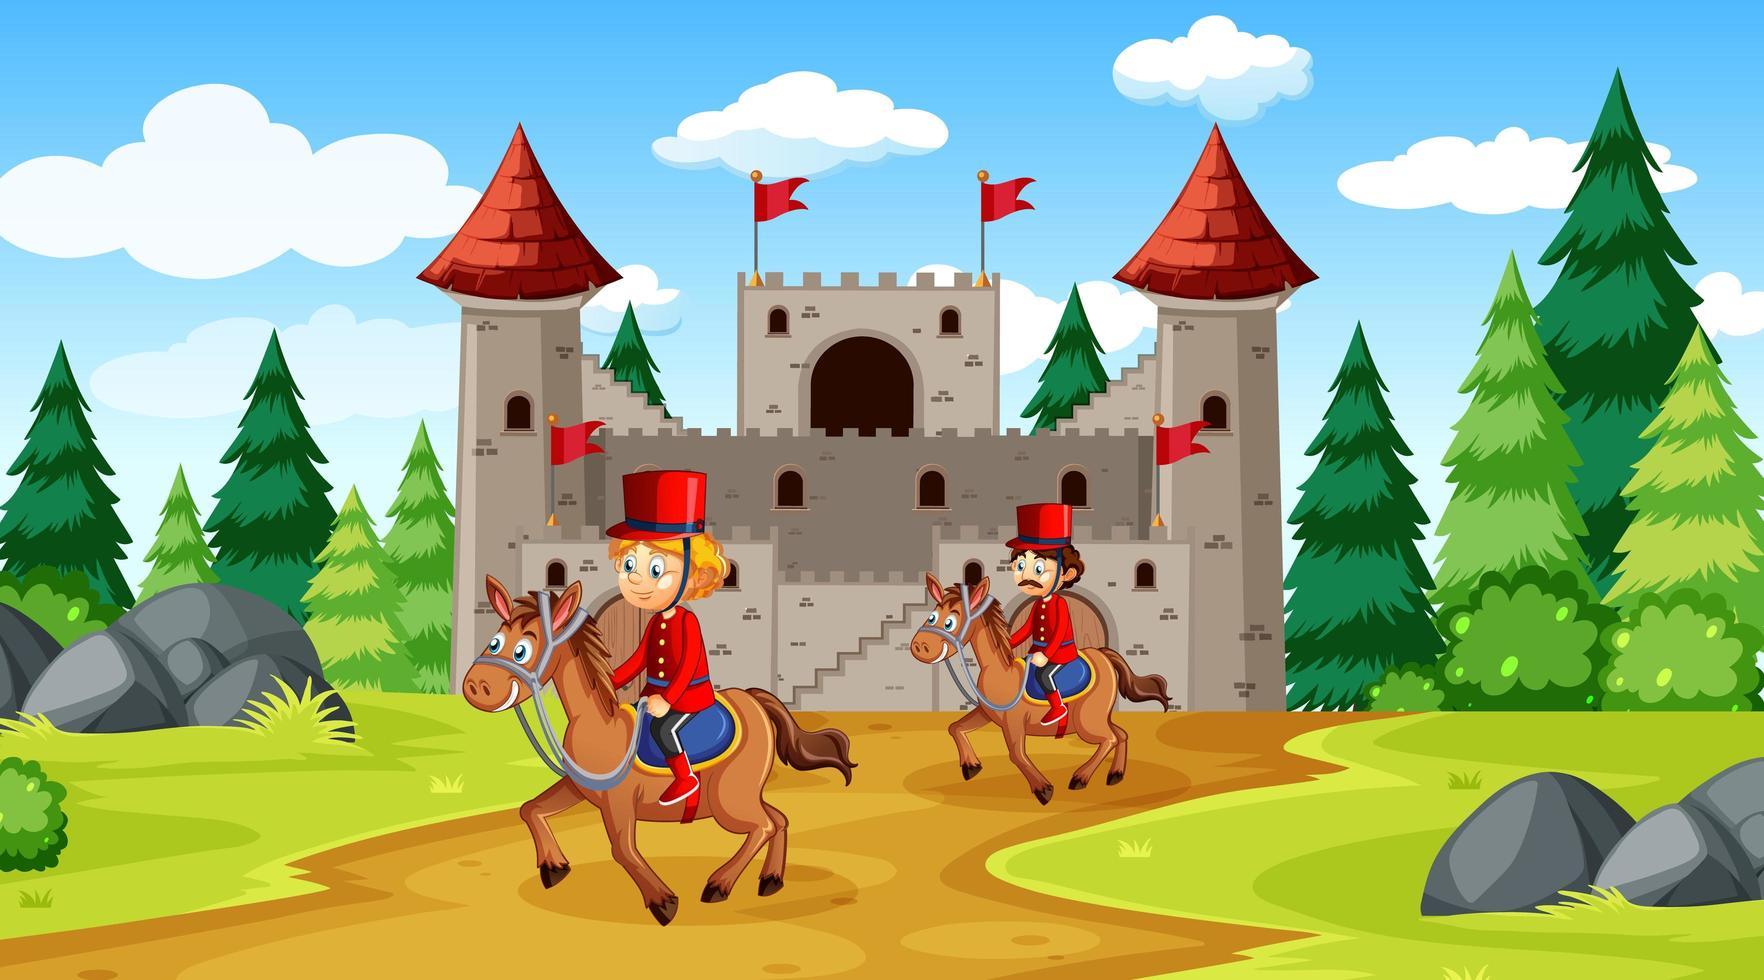 Märchenszene mit Schloss und Soldat Royal Guard Szene vektor